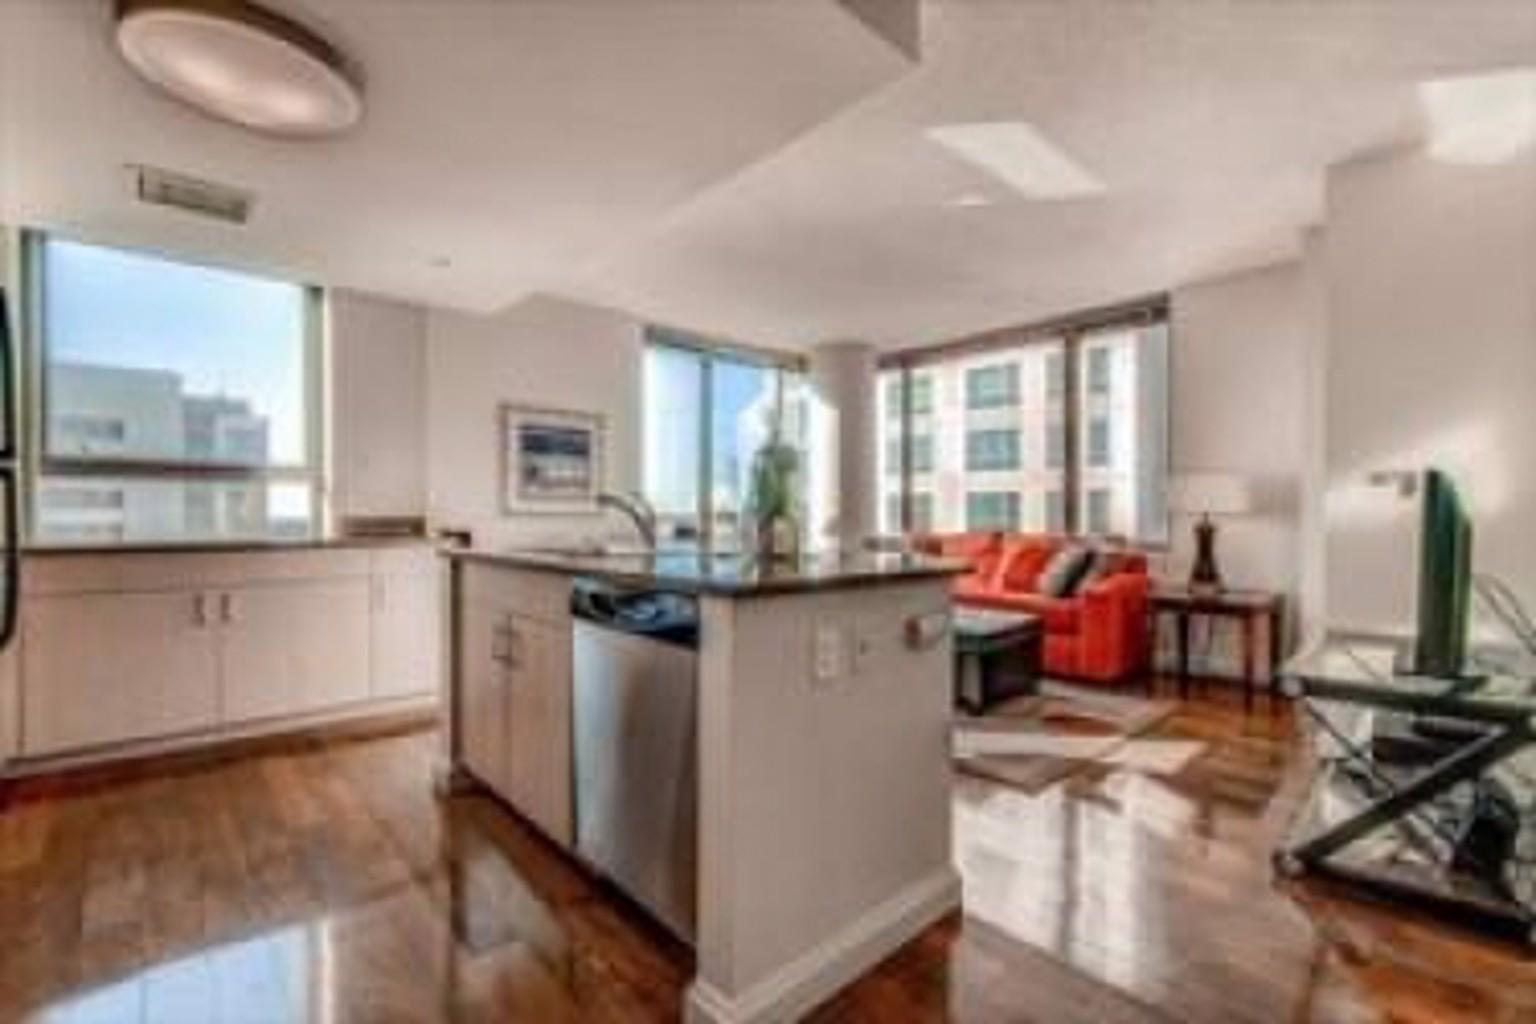 660 Washington Apartements